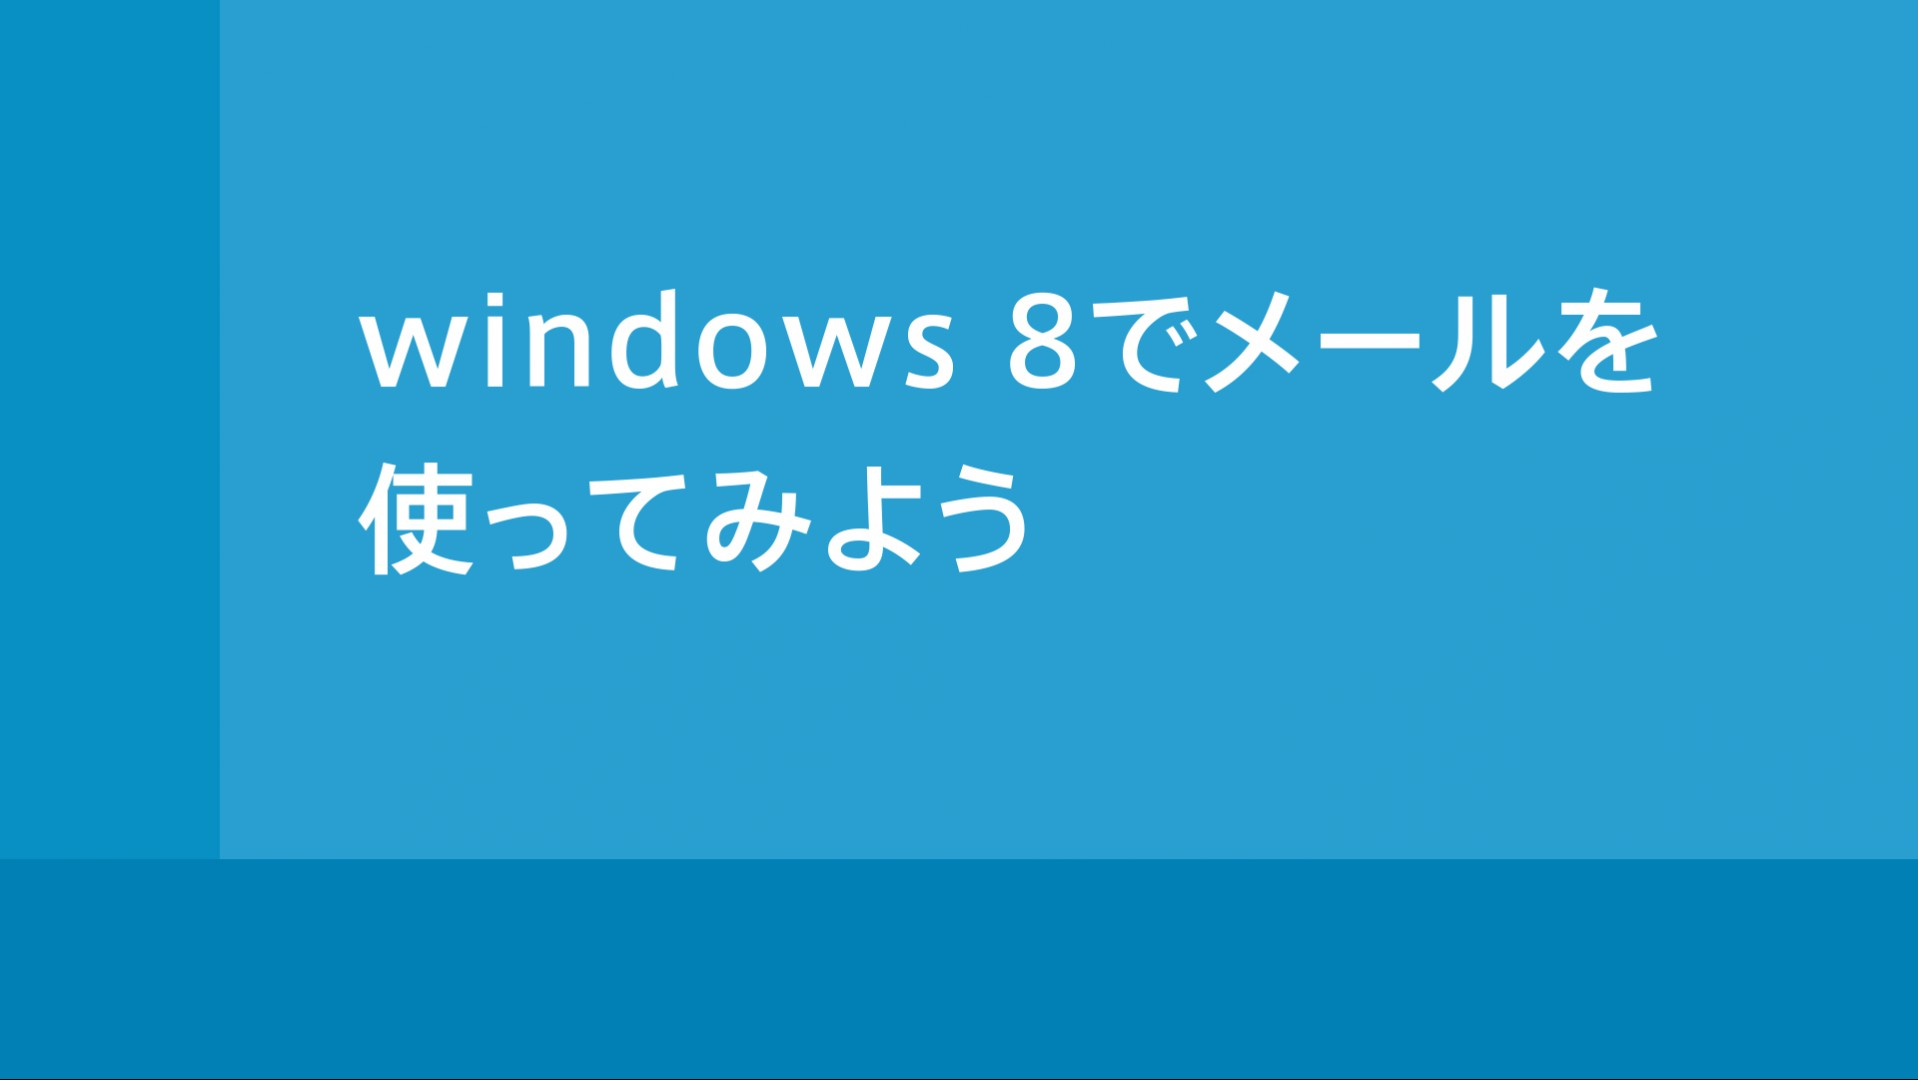 Windows 8 メールの送受信を実行して最新の状態に更新する